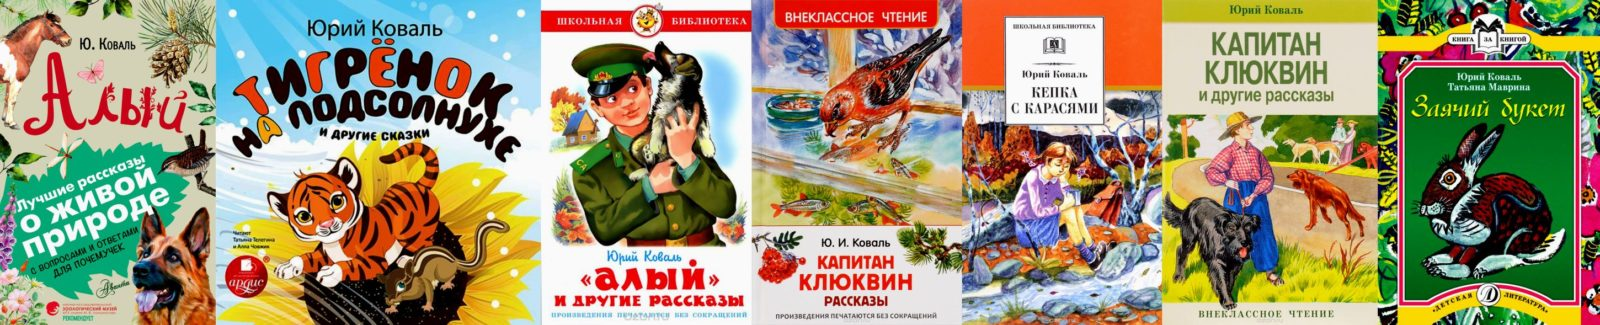 Караси—Юрий Коваль